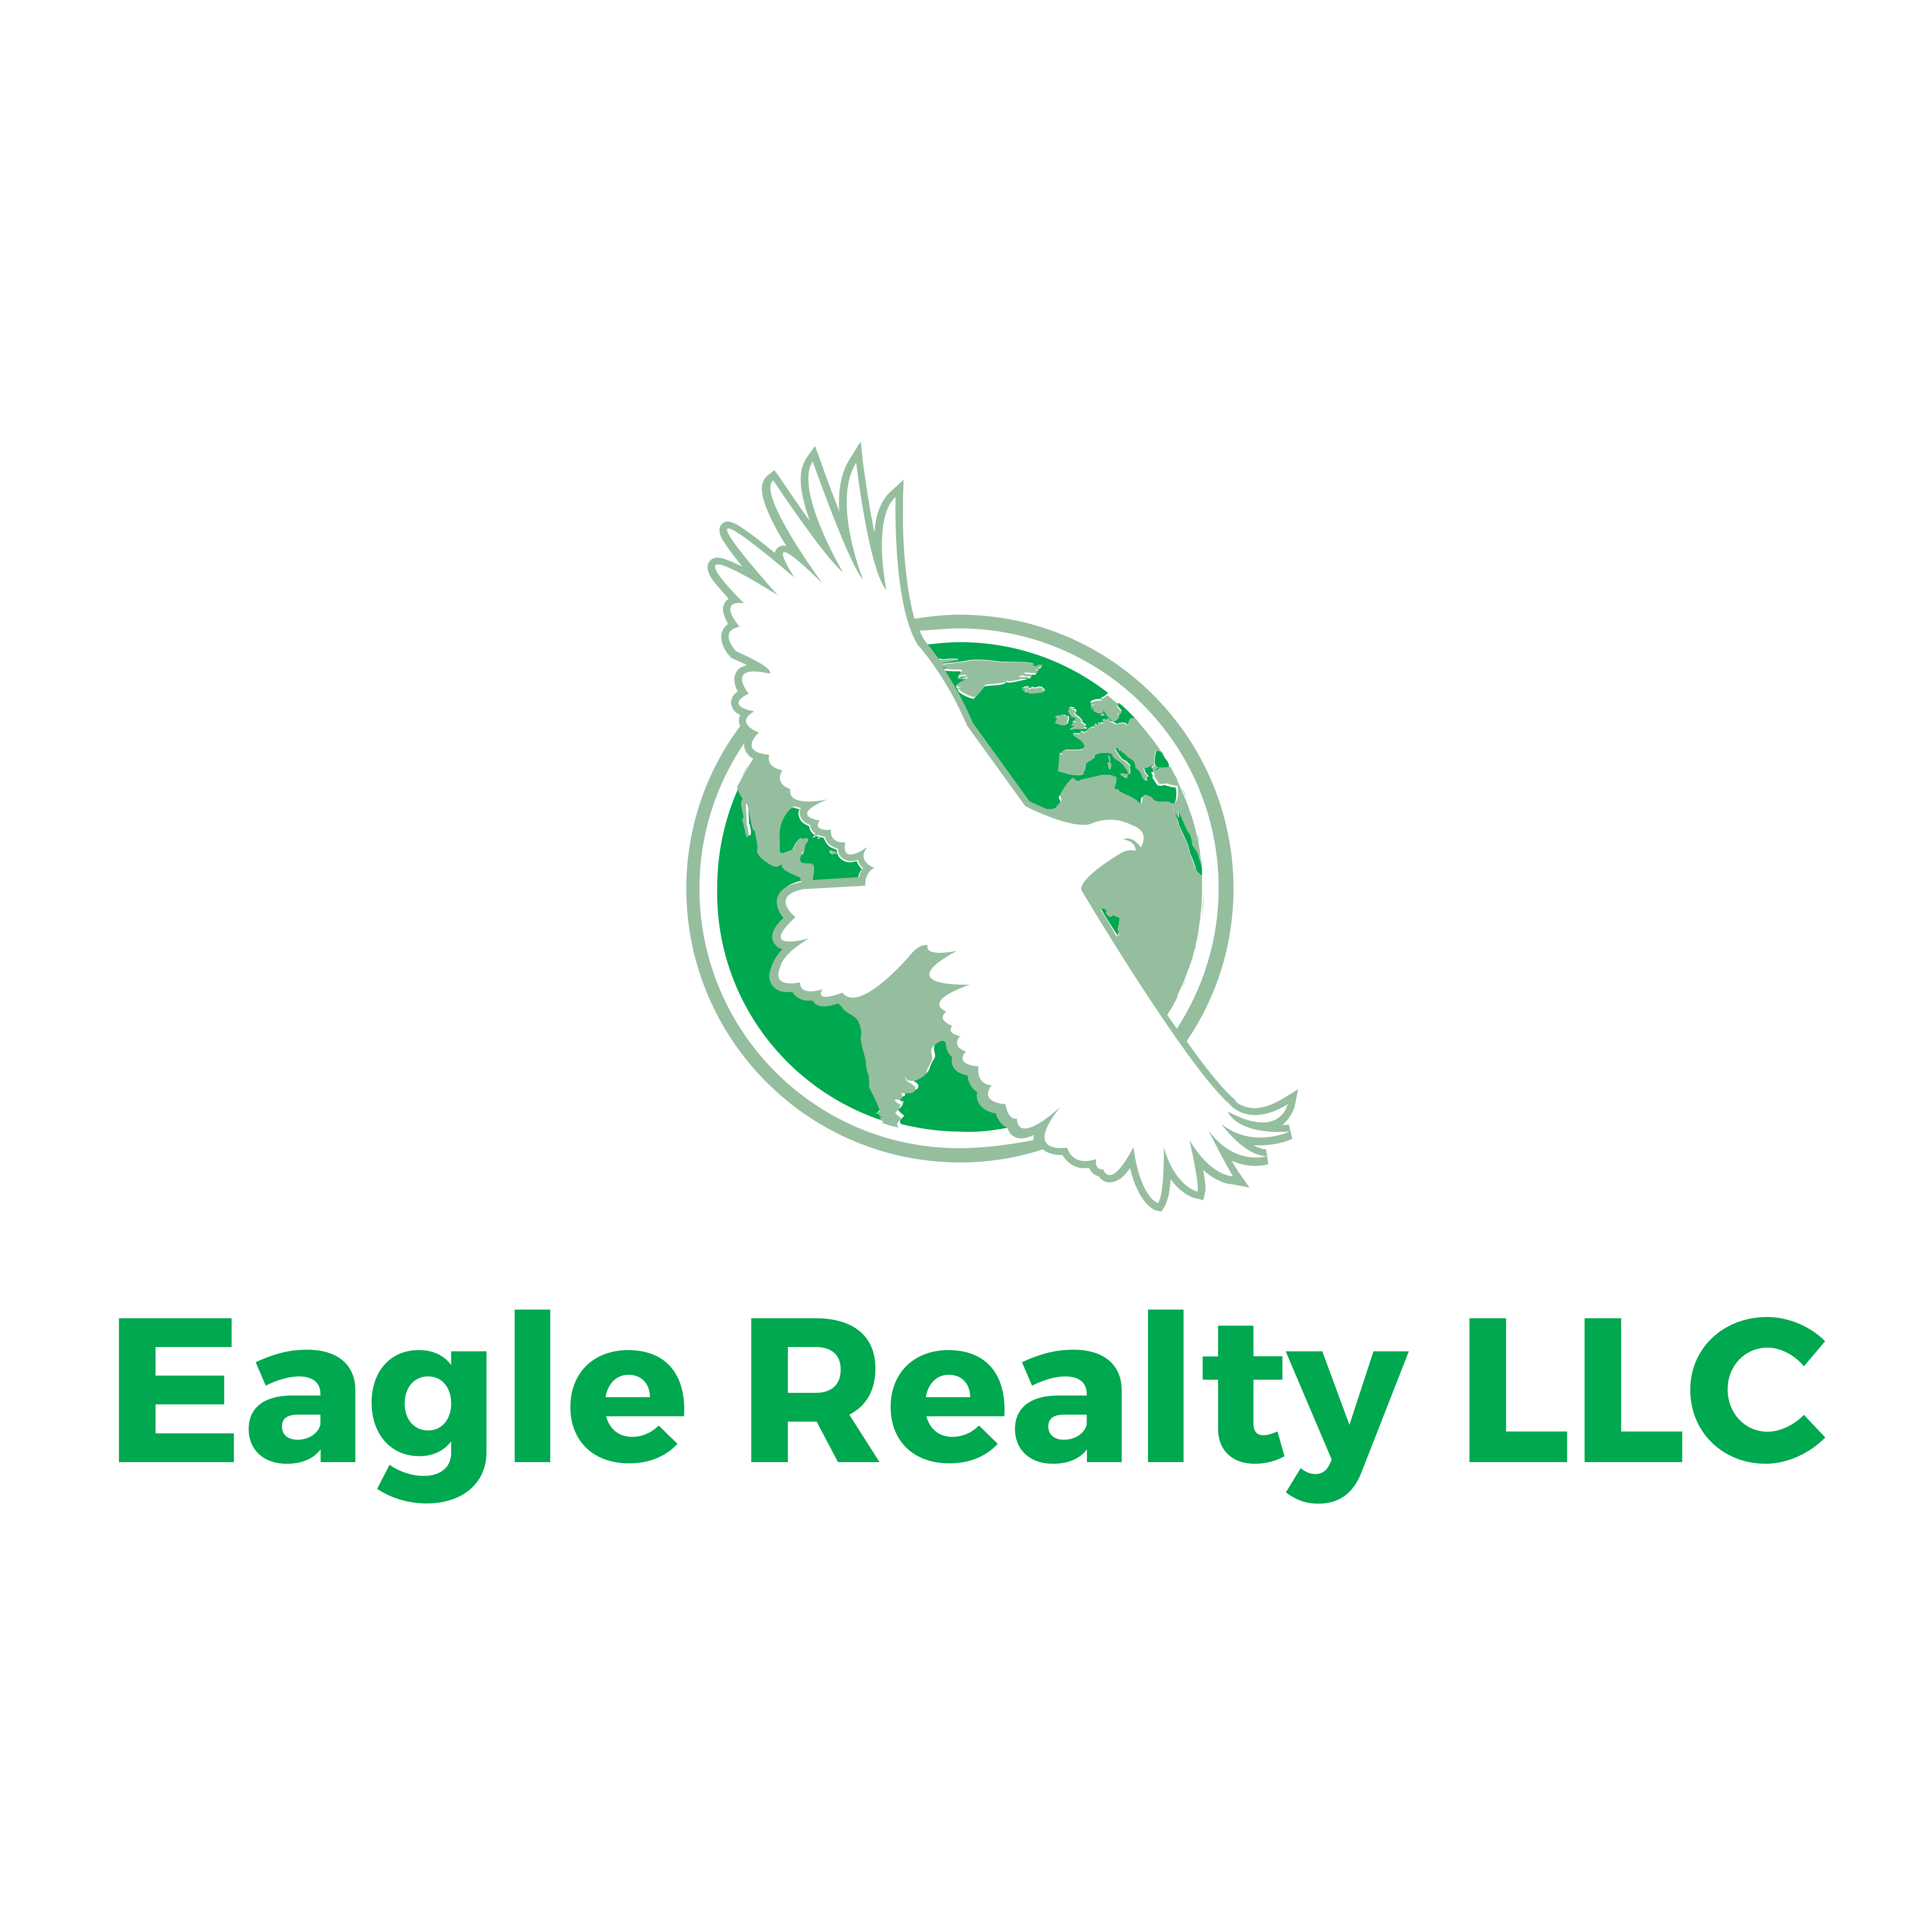 Eagle Realty LLC